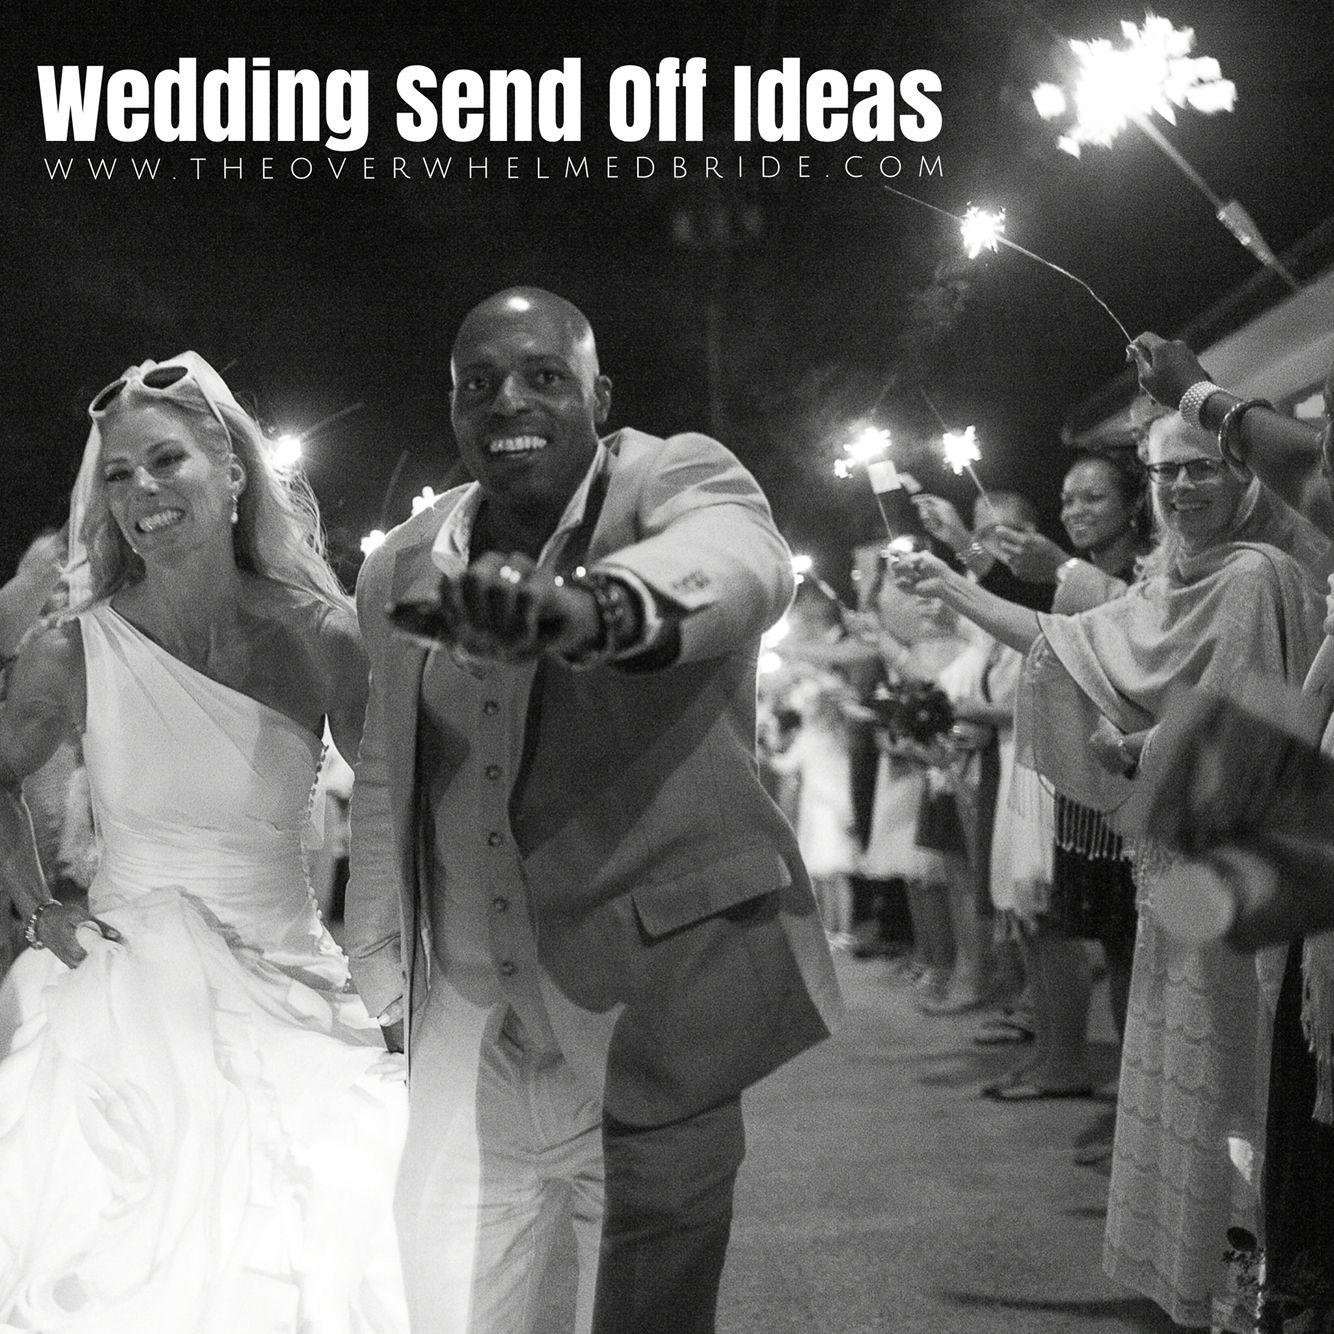 wedding send off ideas Unique Wedding Sendoff Ideas